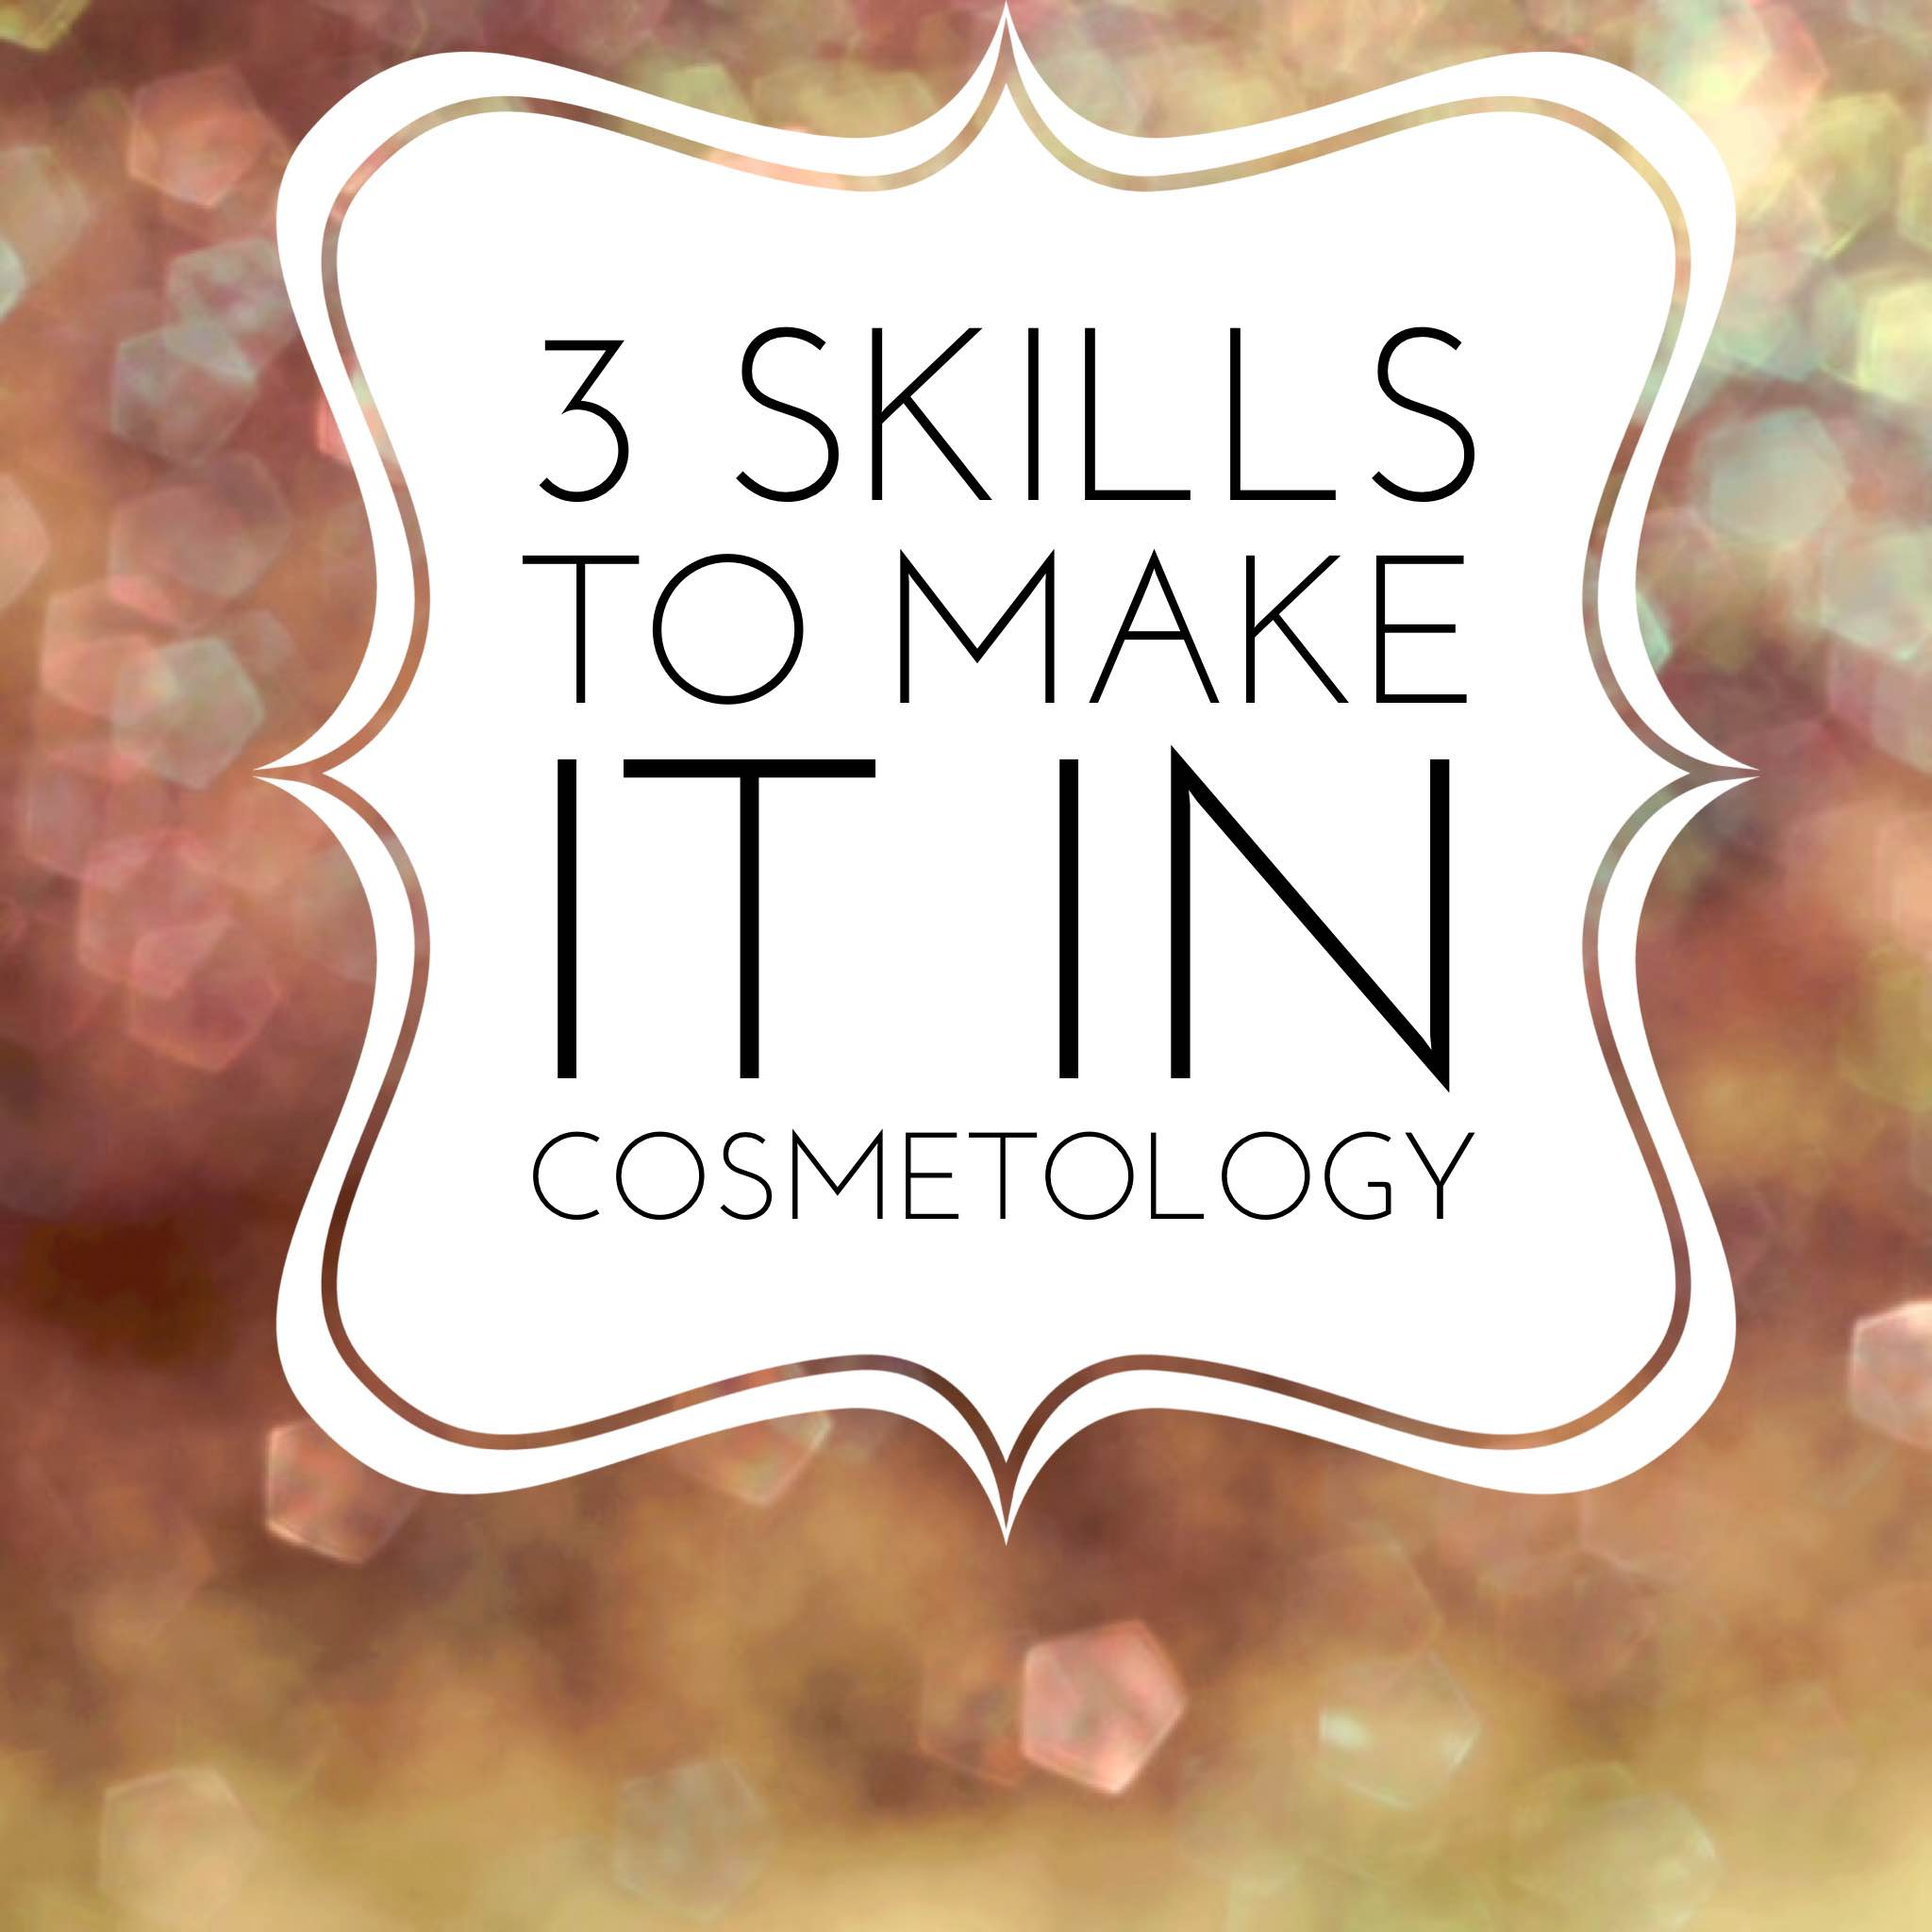 cosmetology skills